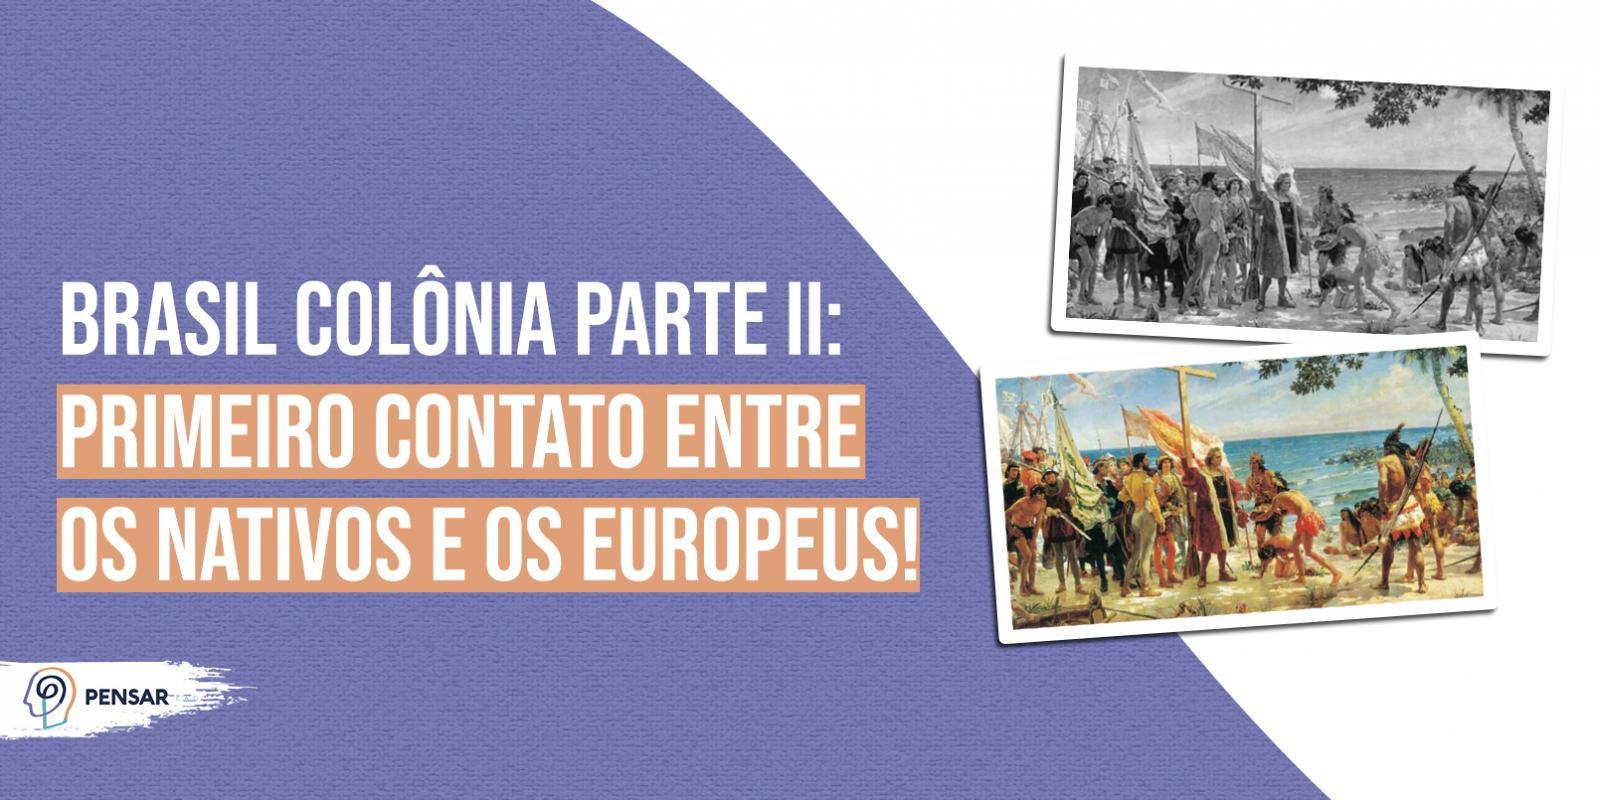 Brasil Colônia parte II: primeiro contato entre os nativos e os europeus!